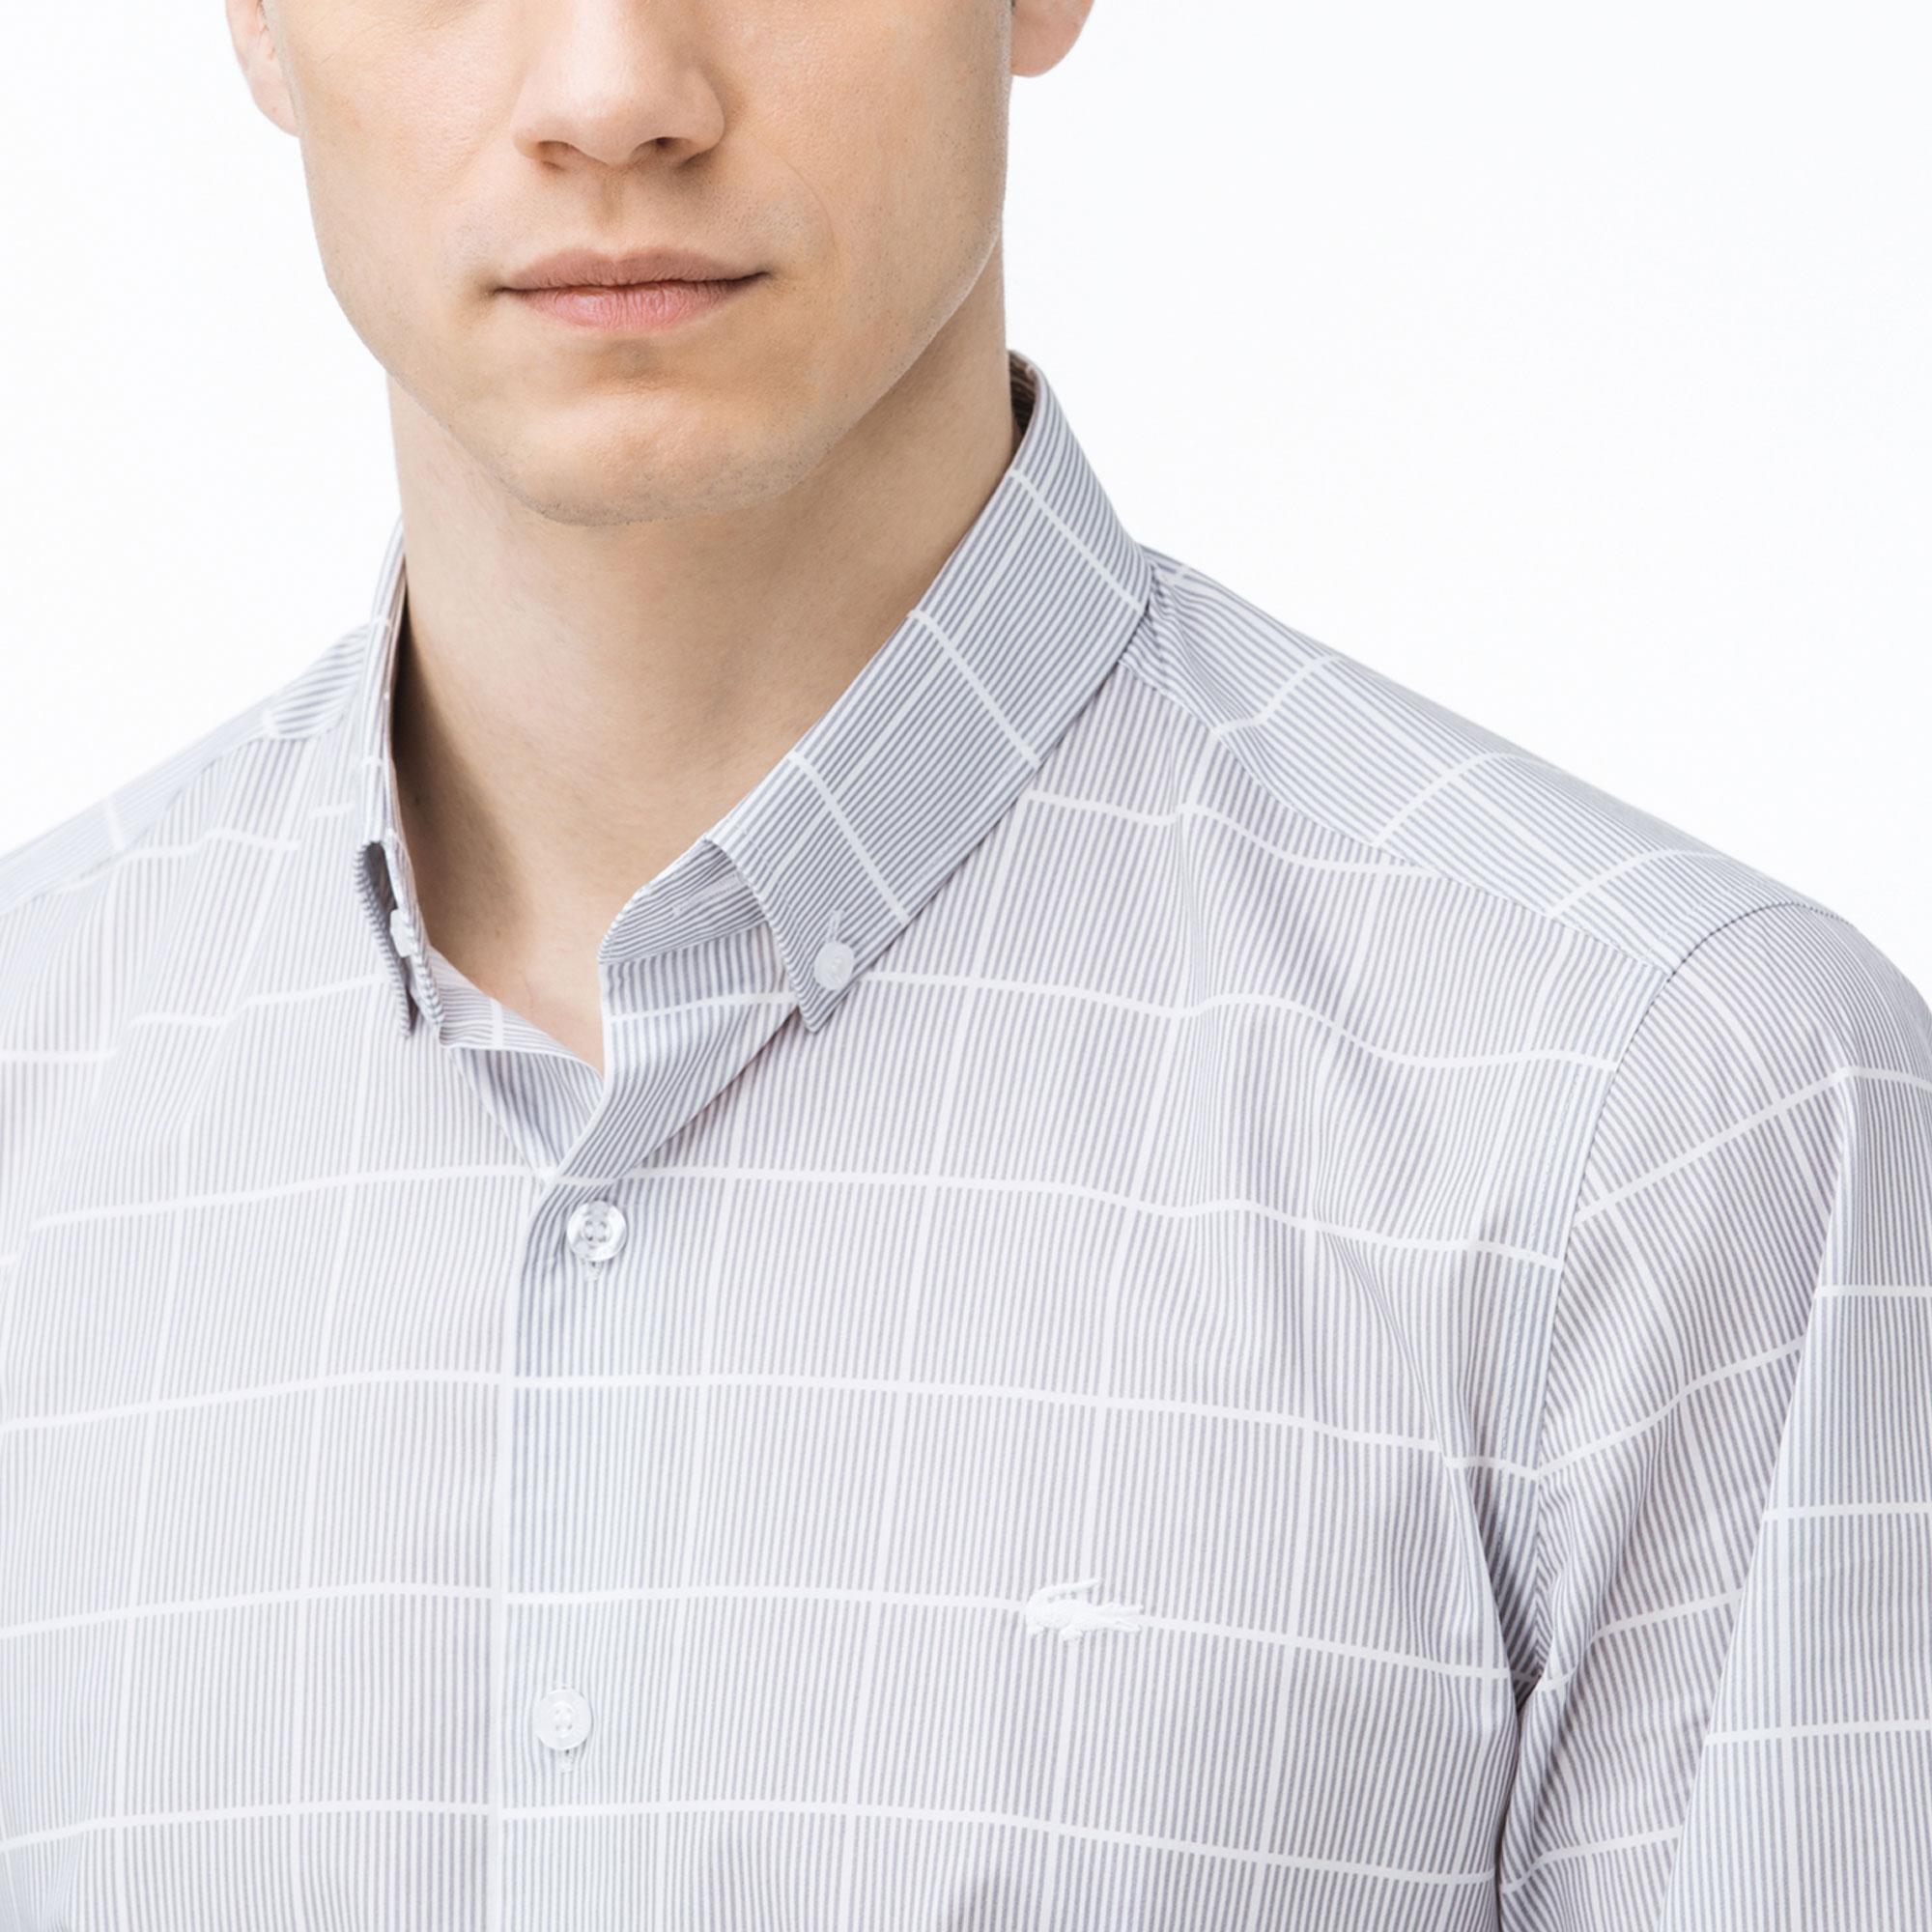 Lacoste Erkek Slim Fit Desenli Gri Gömlek